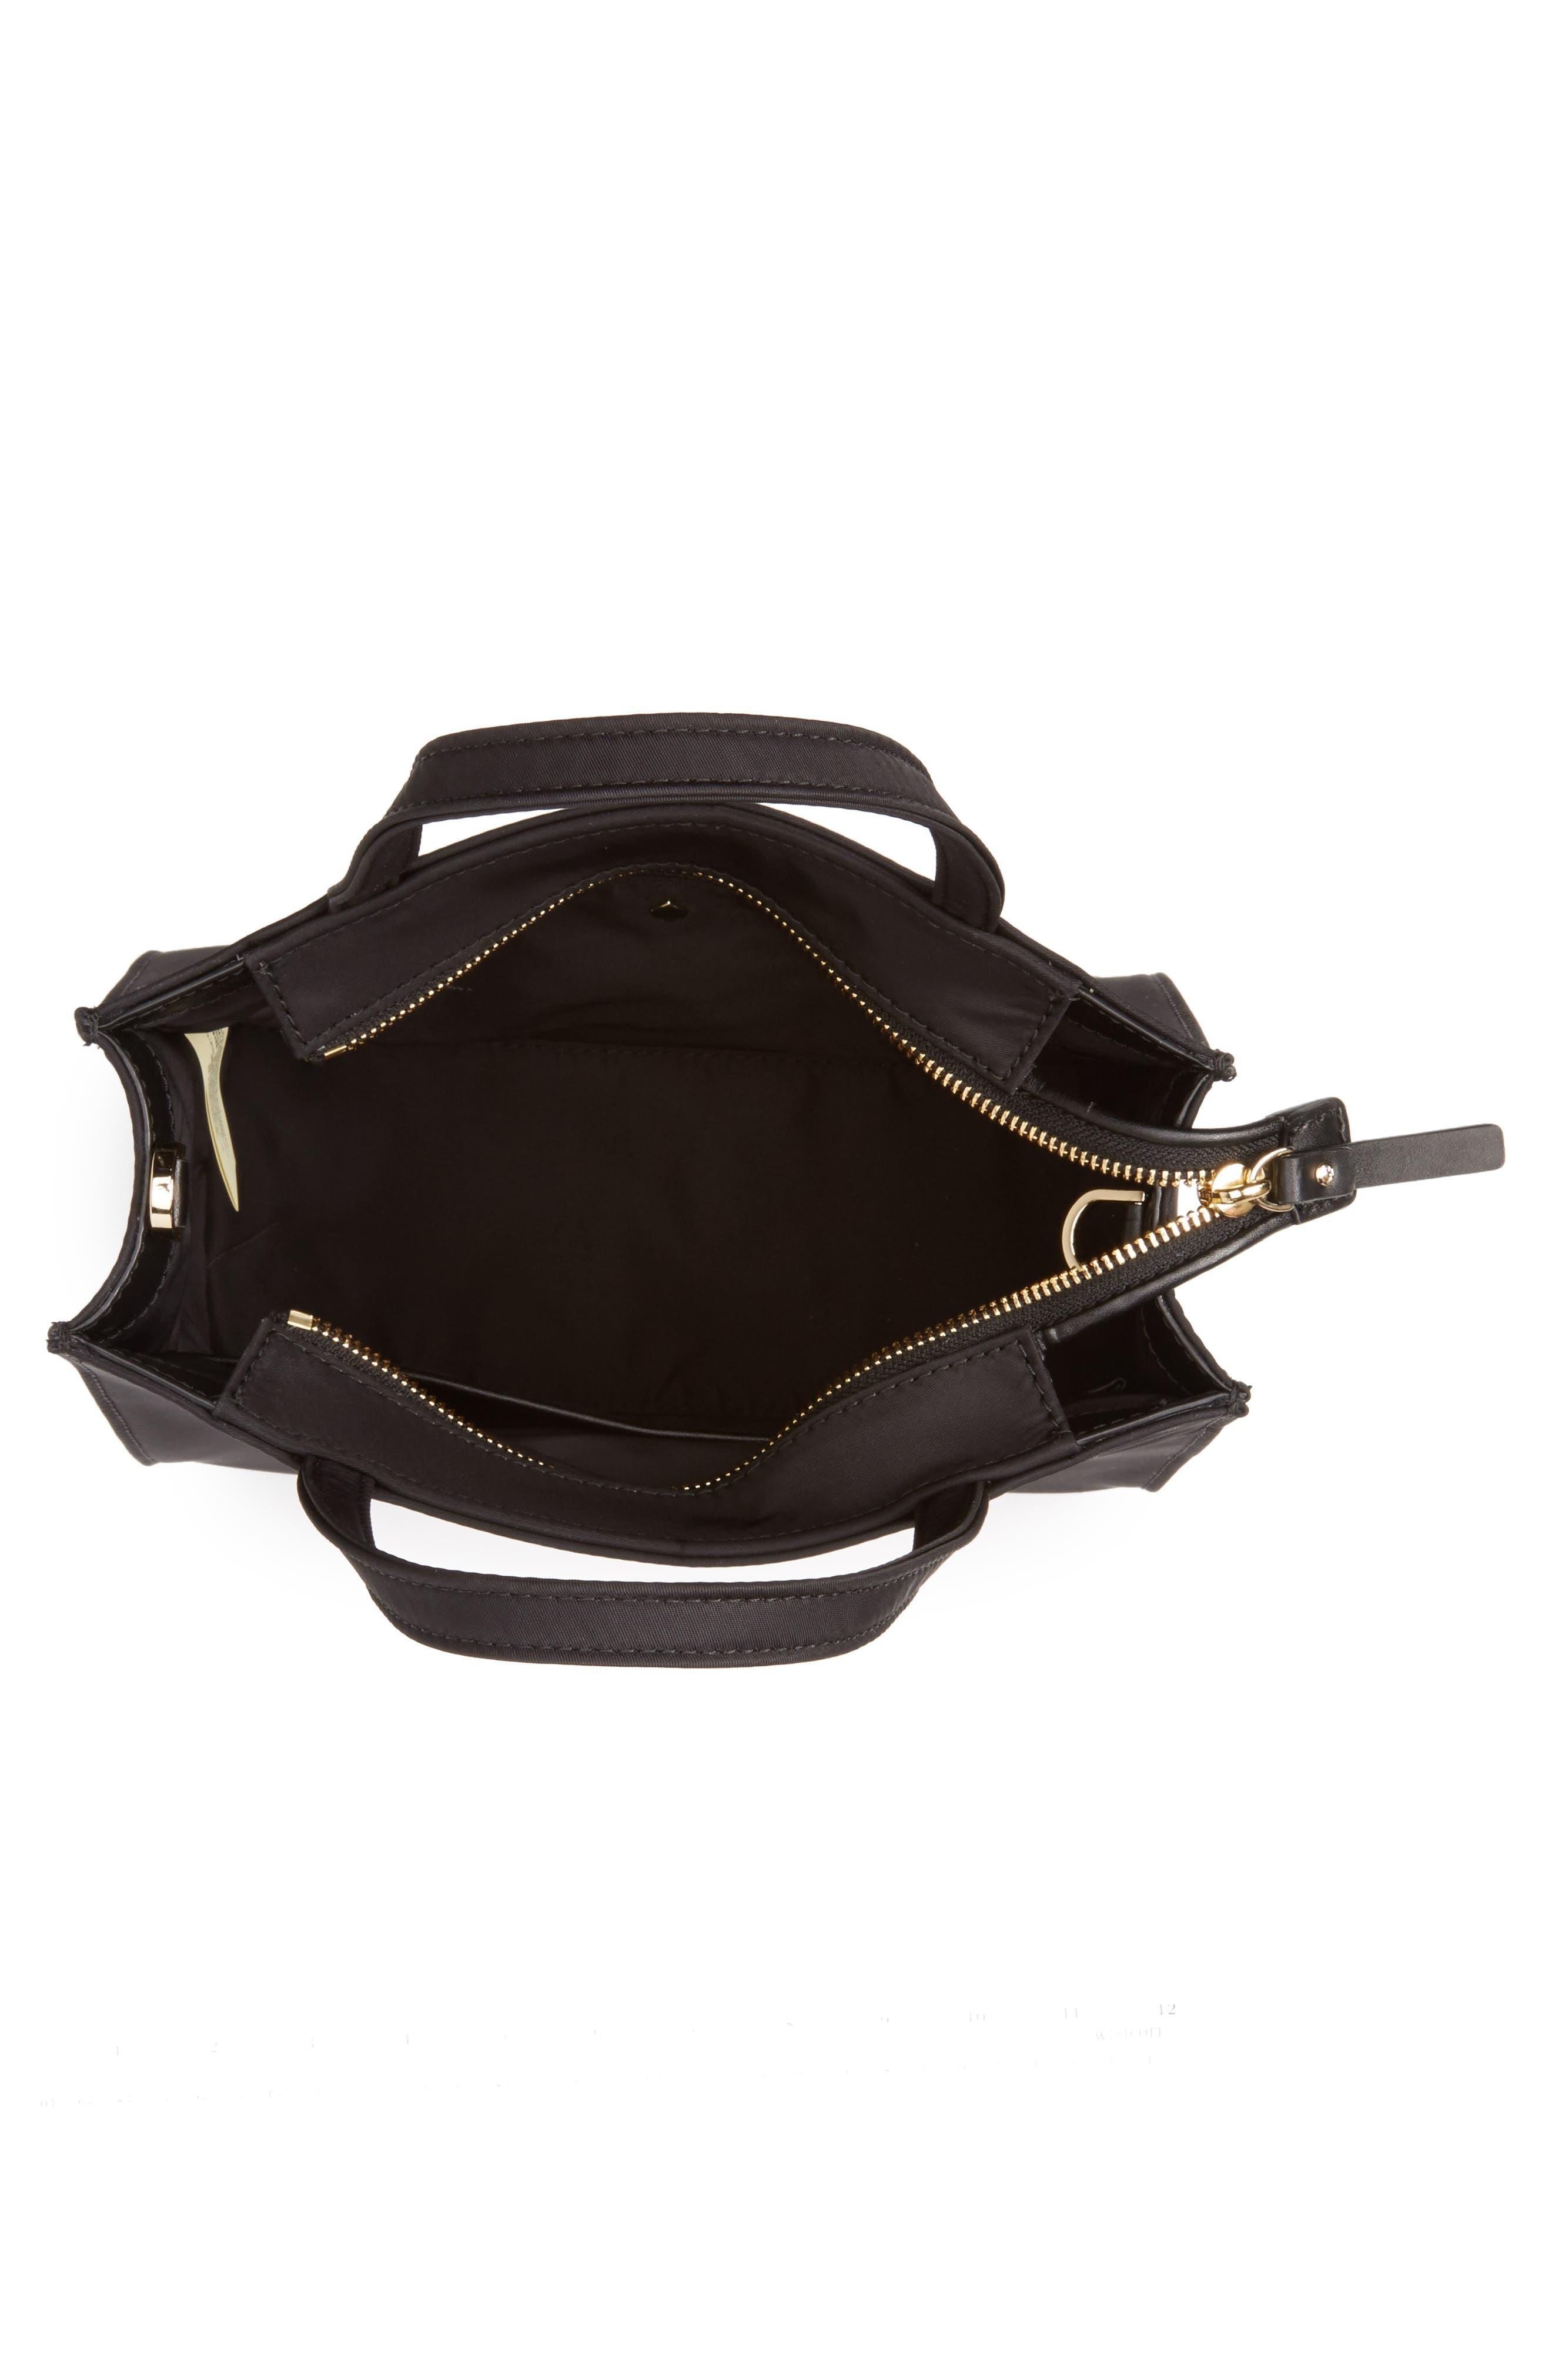 watson lane – sam nylon satchel,                             Alternate thumbnail 4, color,                             BLACK